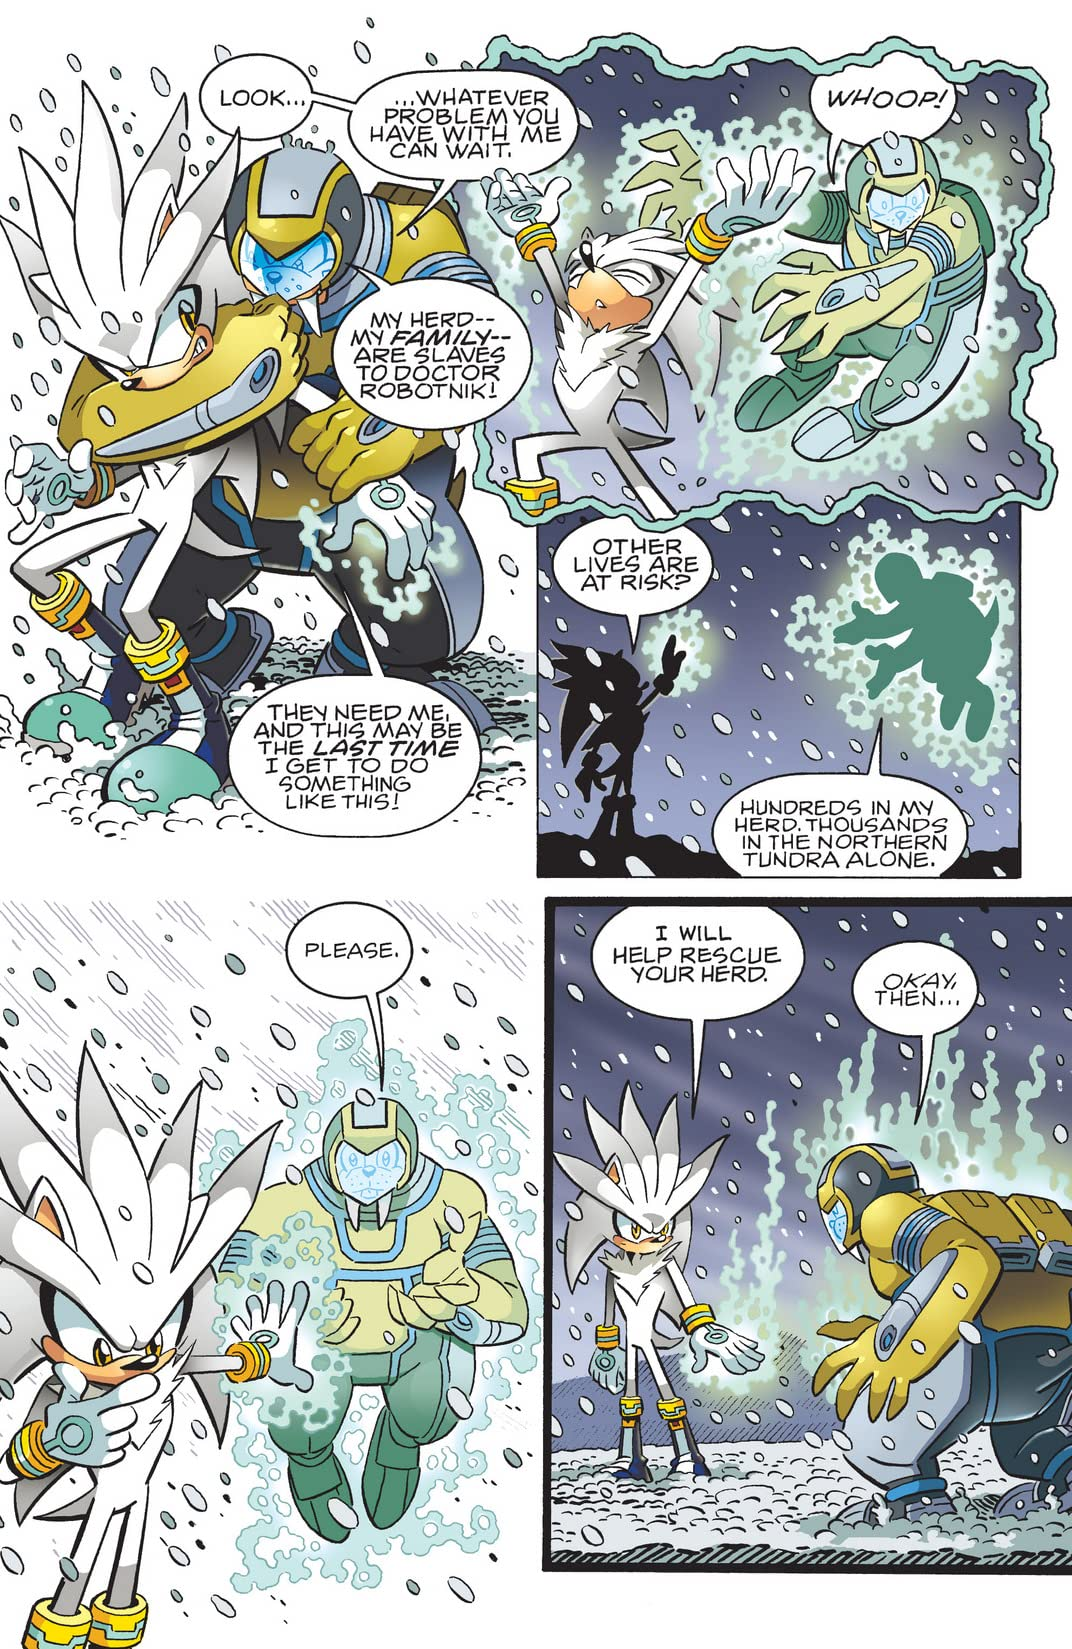 Sonic the Hedgehog #216